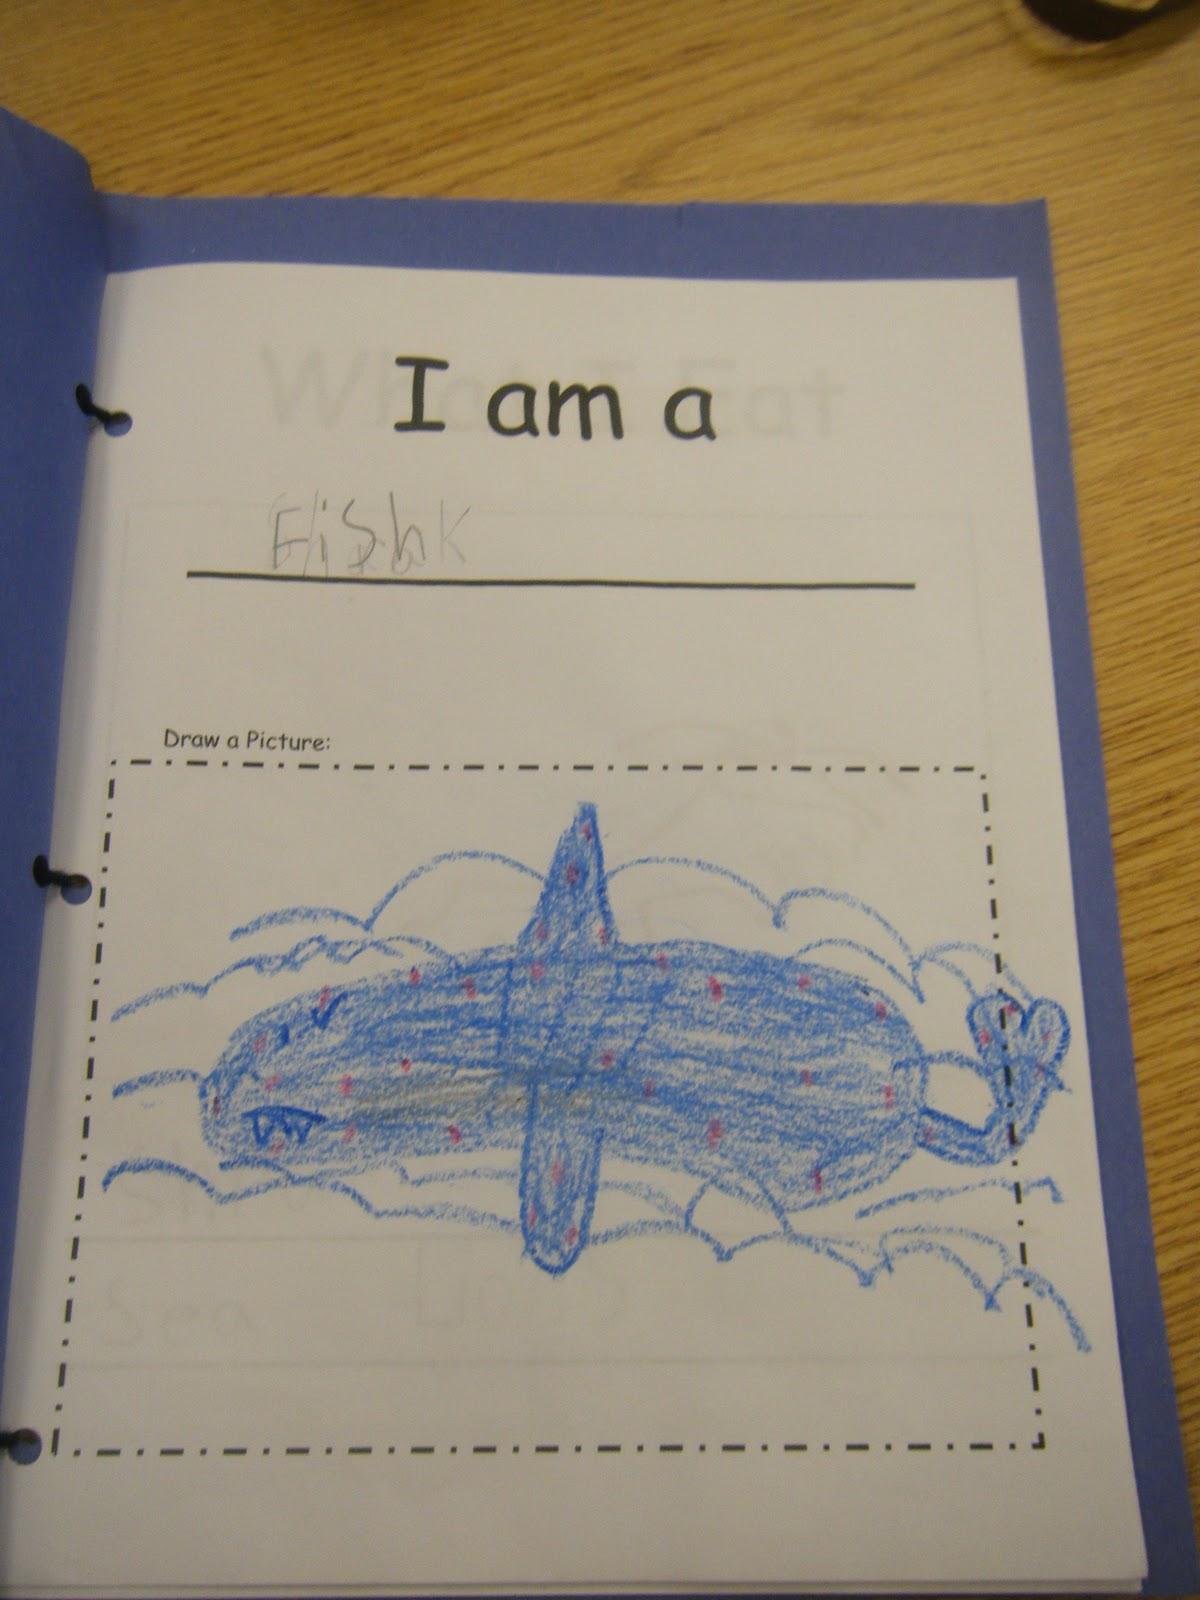 Dare essay examples 2012 image 3